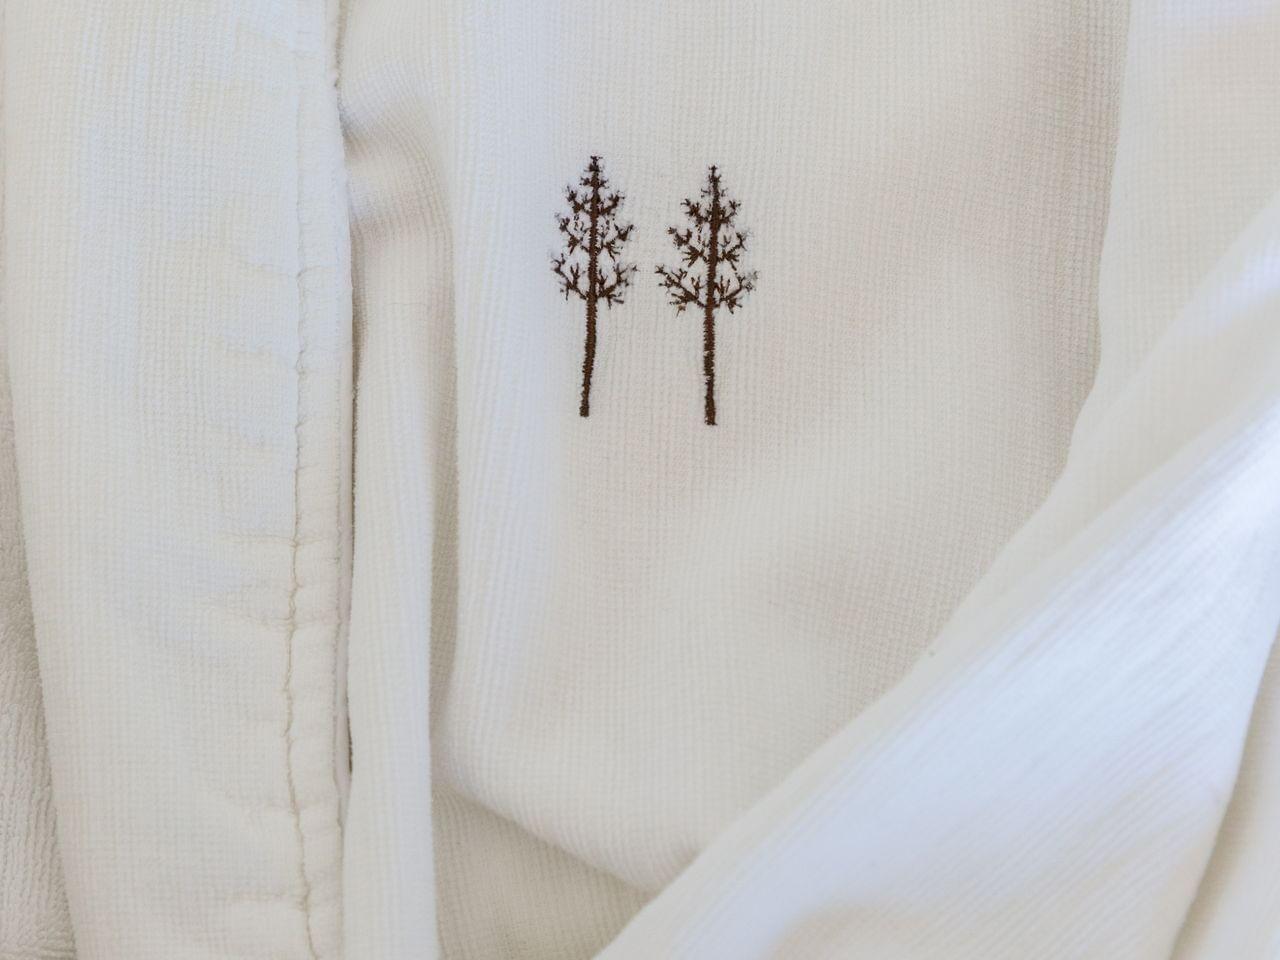 Heritage House Resort logo stitched to a white bathrobe